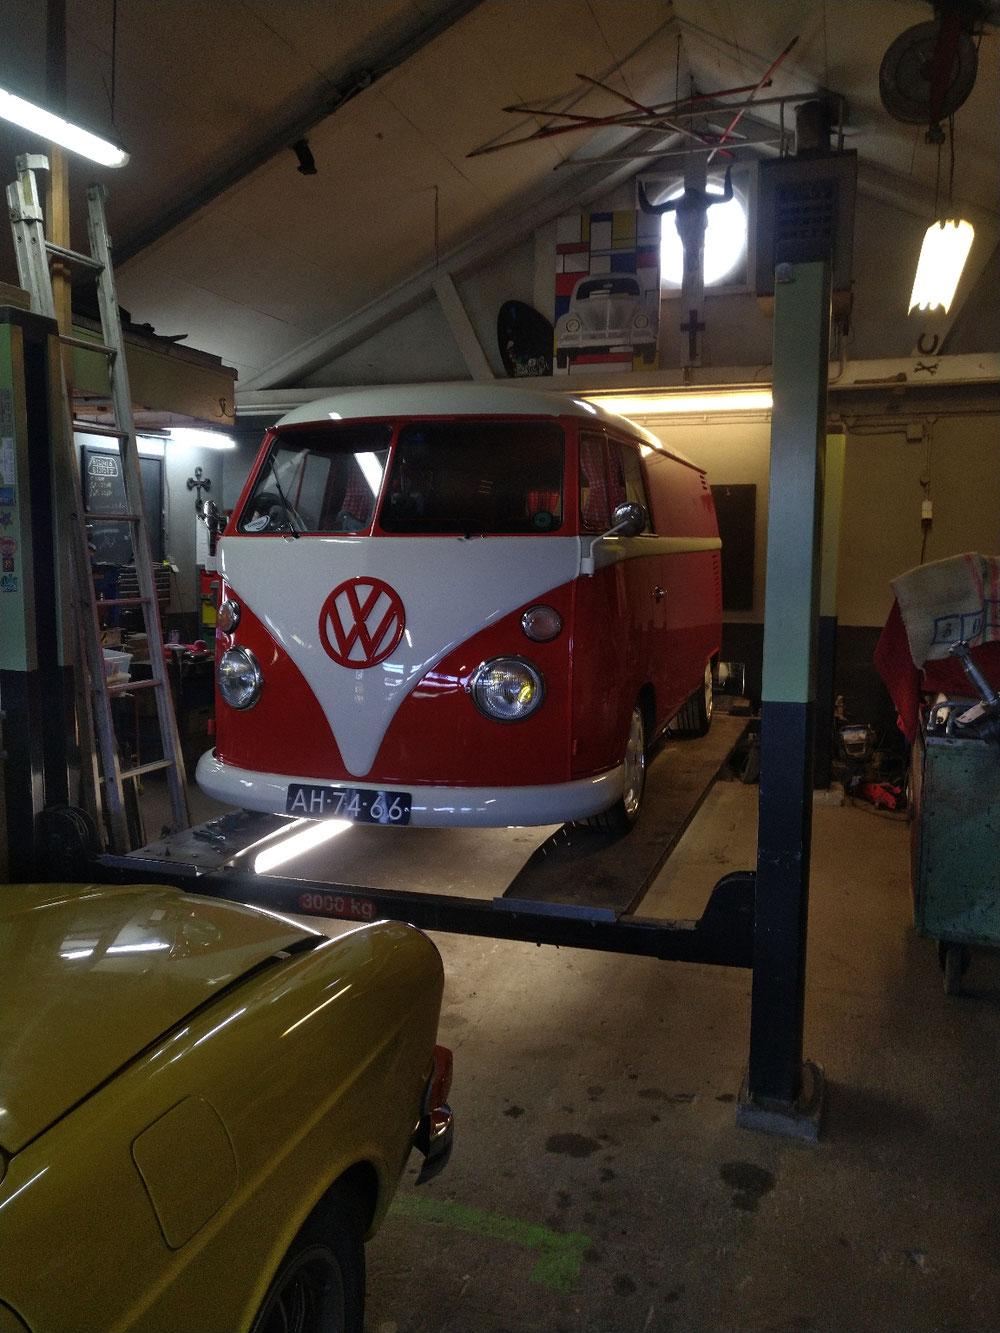 1835. Motor, porsche discs allround, irs ,just needed a Rack & Pinion steering upgrade!